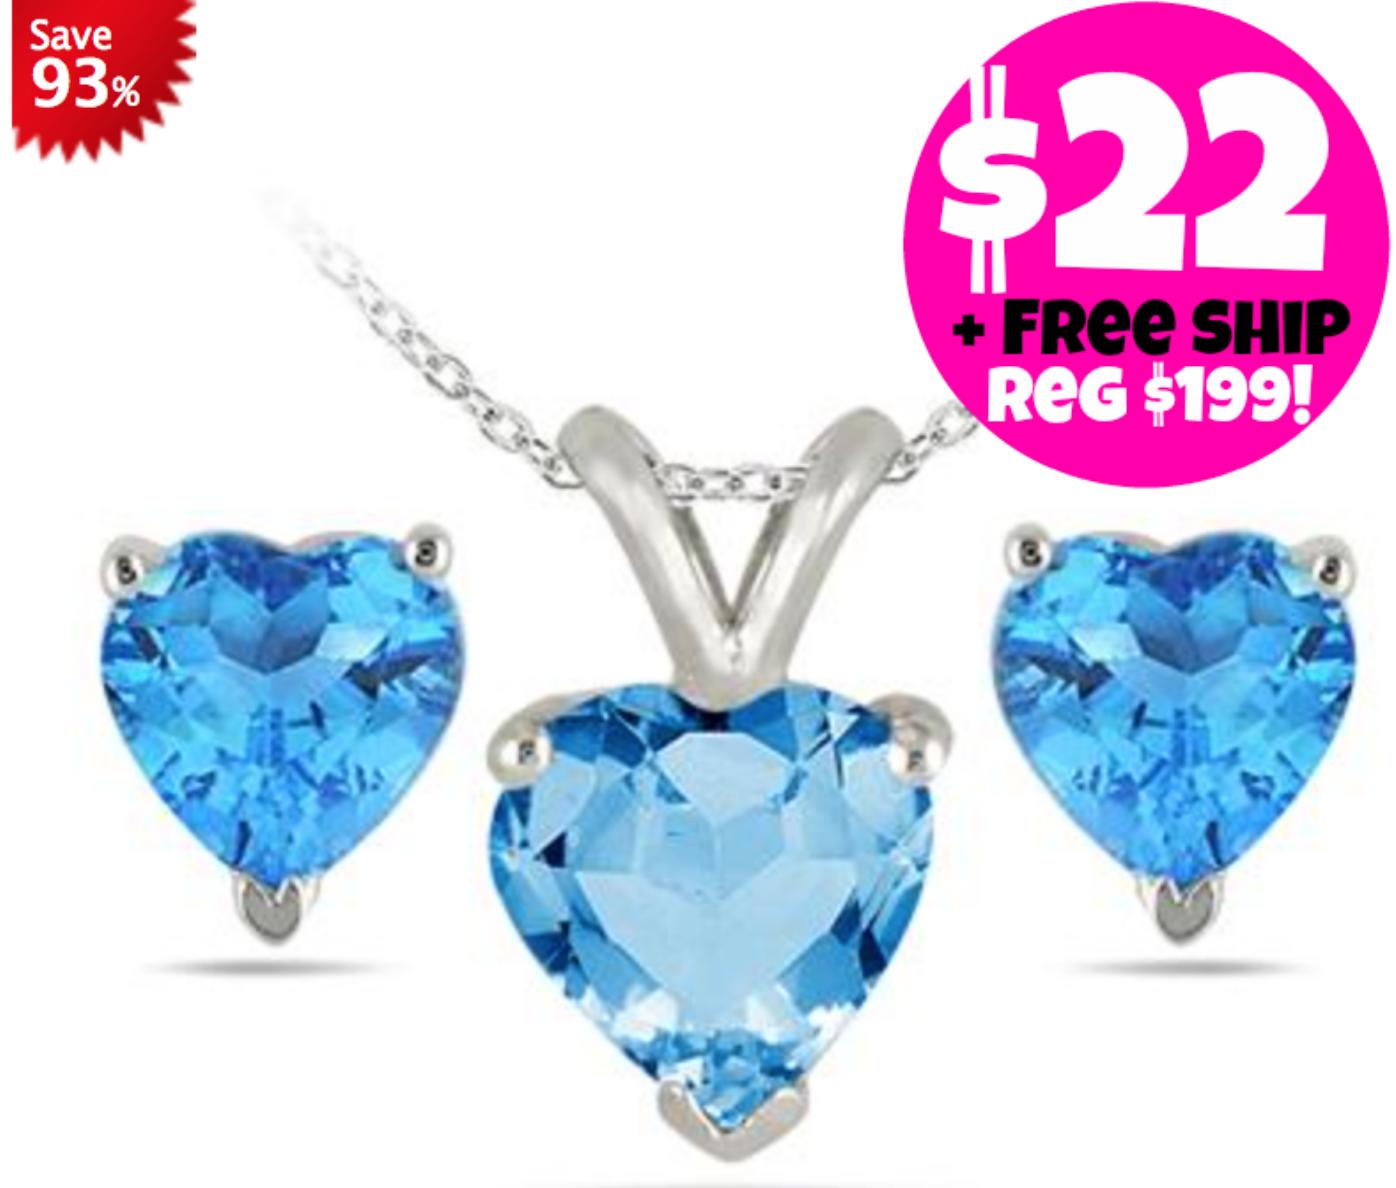 http://www.thebinderladies.com/2015/02/szul-24-carat-heart-shaped-blue-topaz.html#.VNllIYfduyM